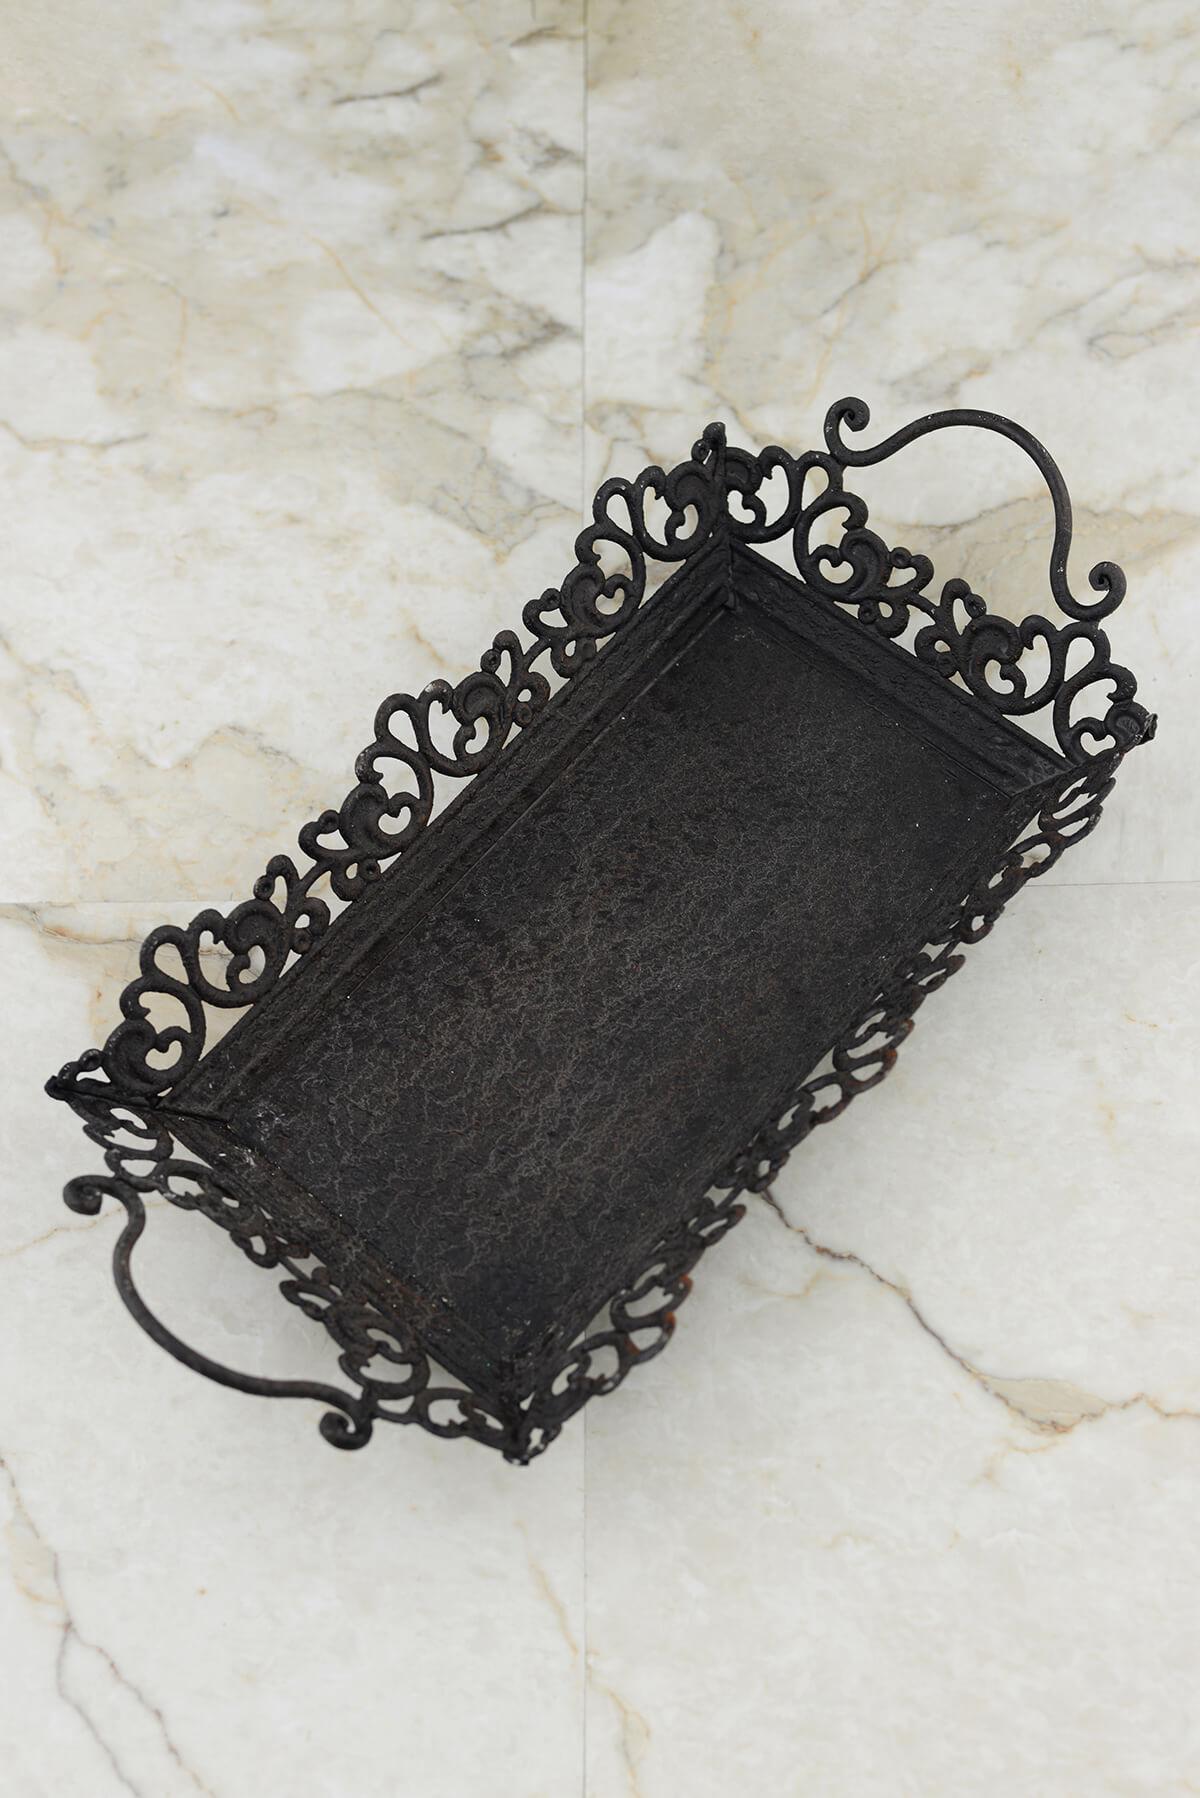 Decorative Metal Tray Decorative Rustic Black Metal Tray With Handles